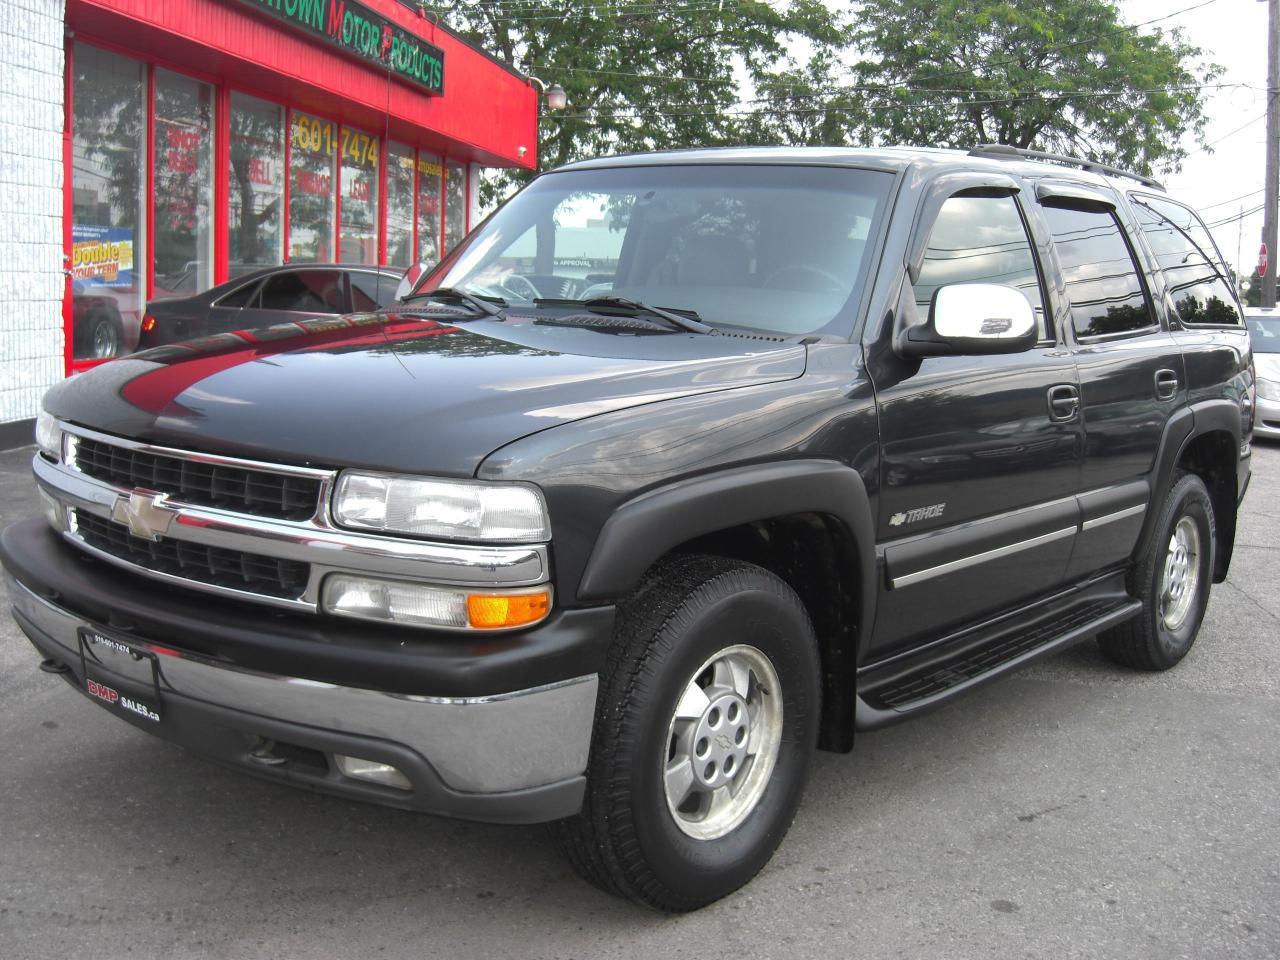 2003 Chevrolet Tahoe SLT 4WD